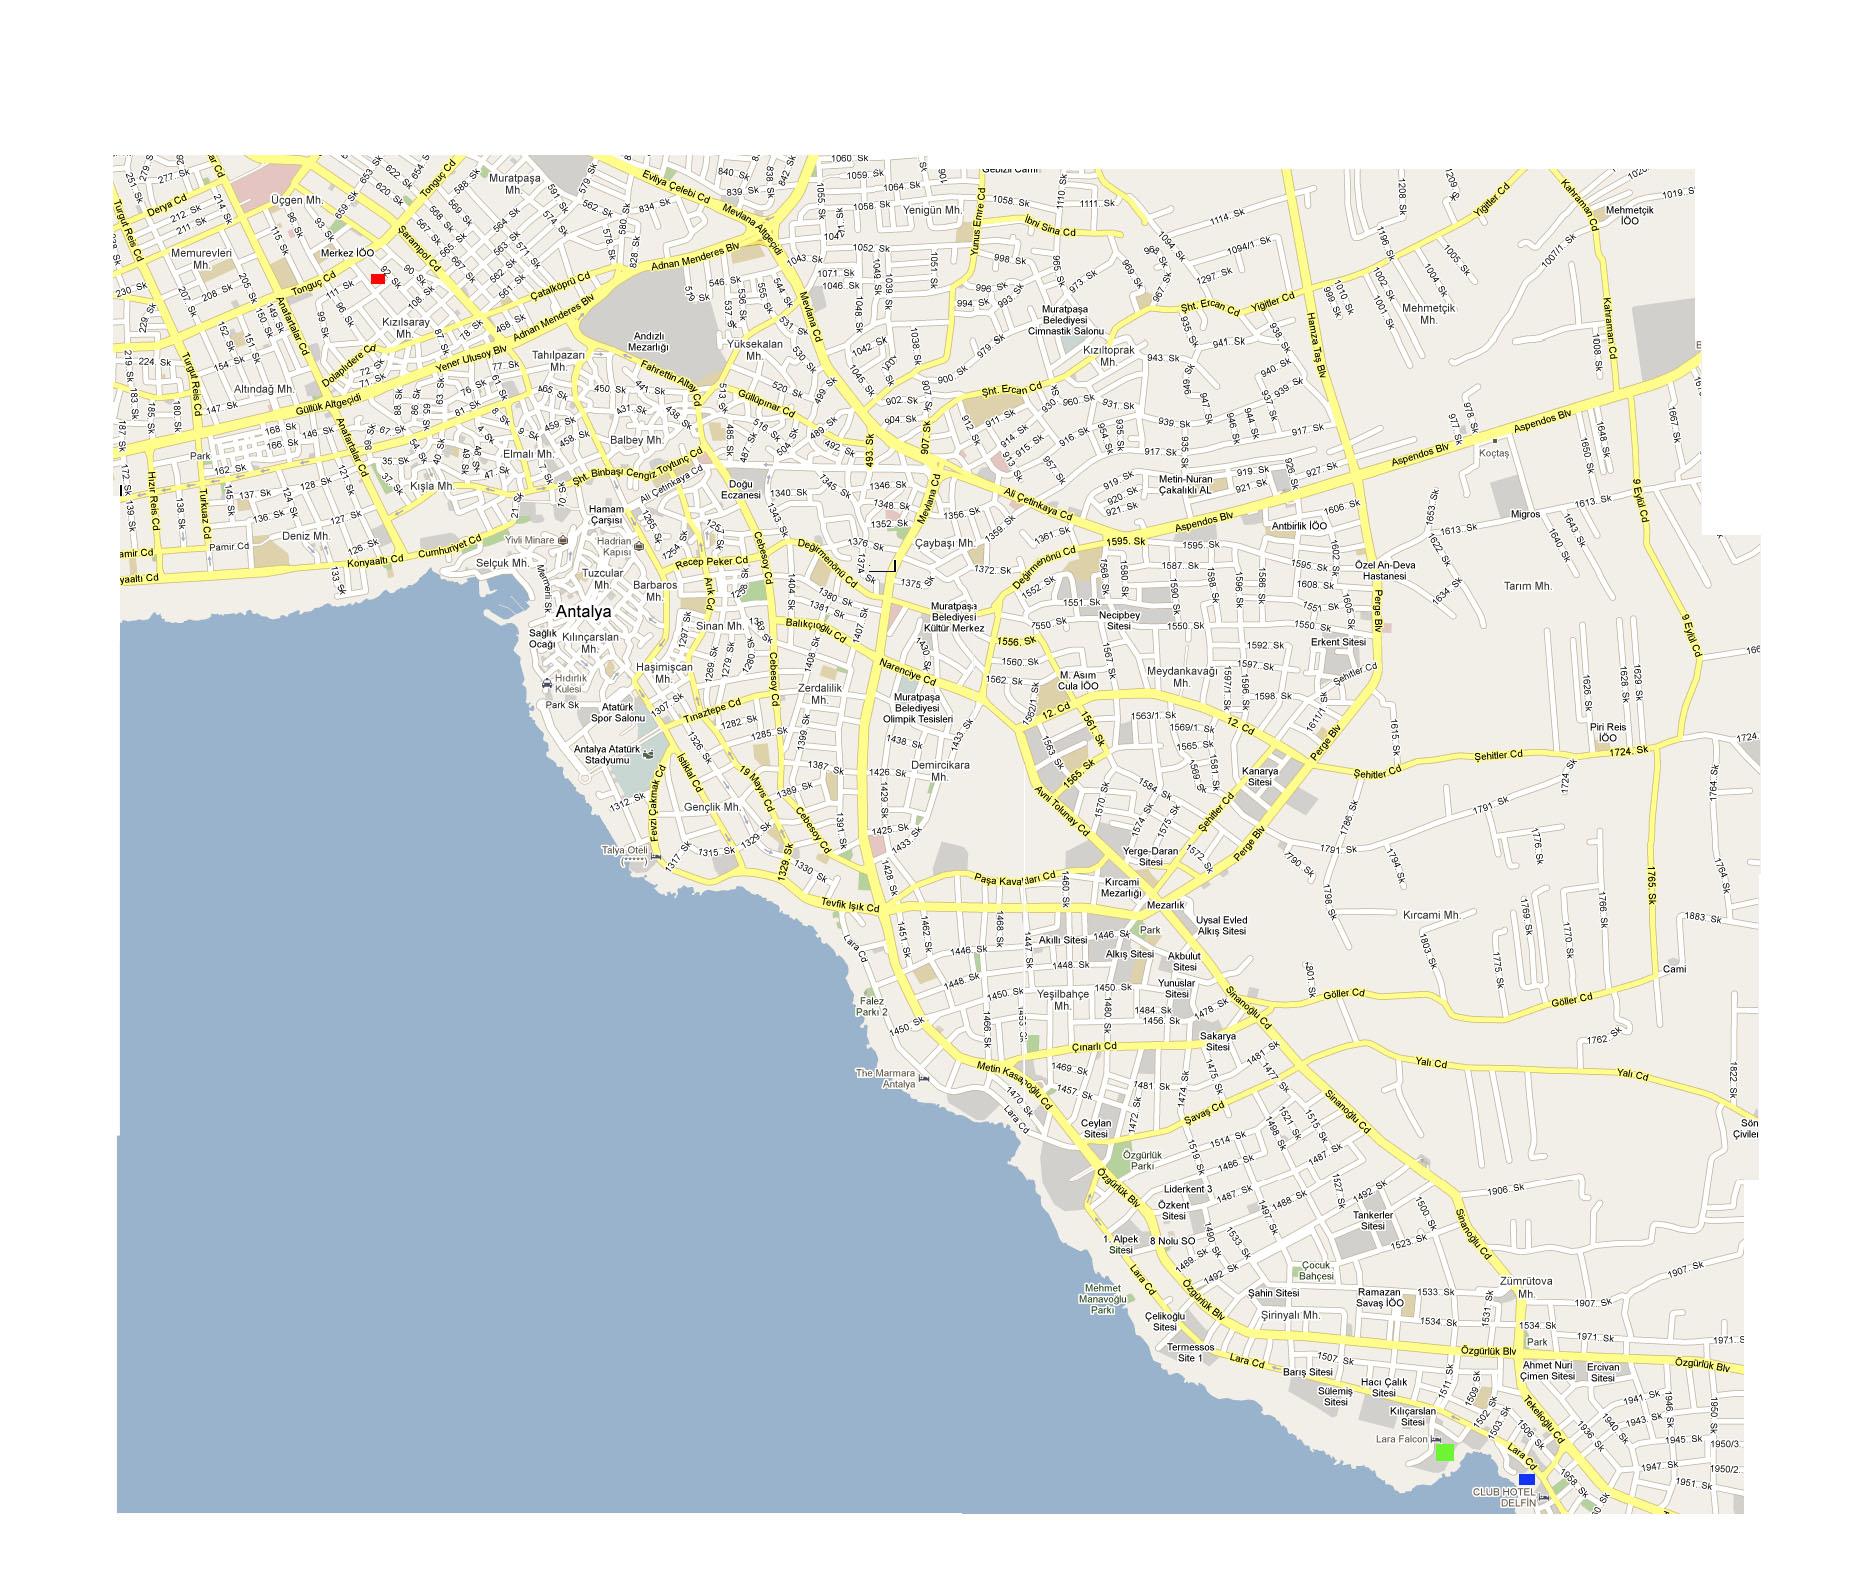 Карта анталии и региона анталии